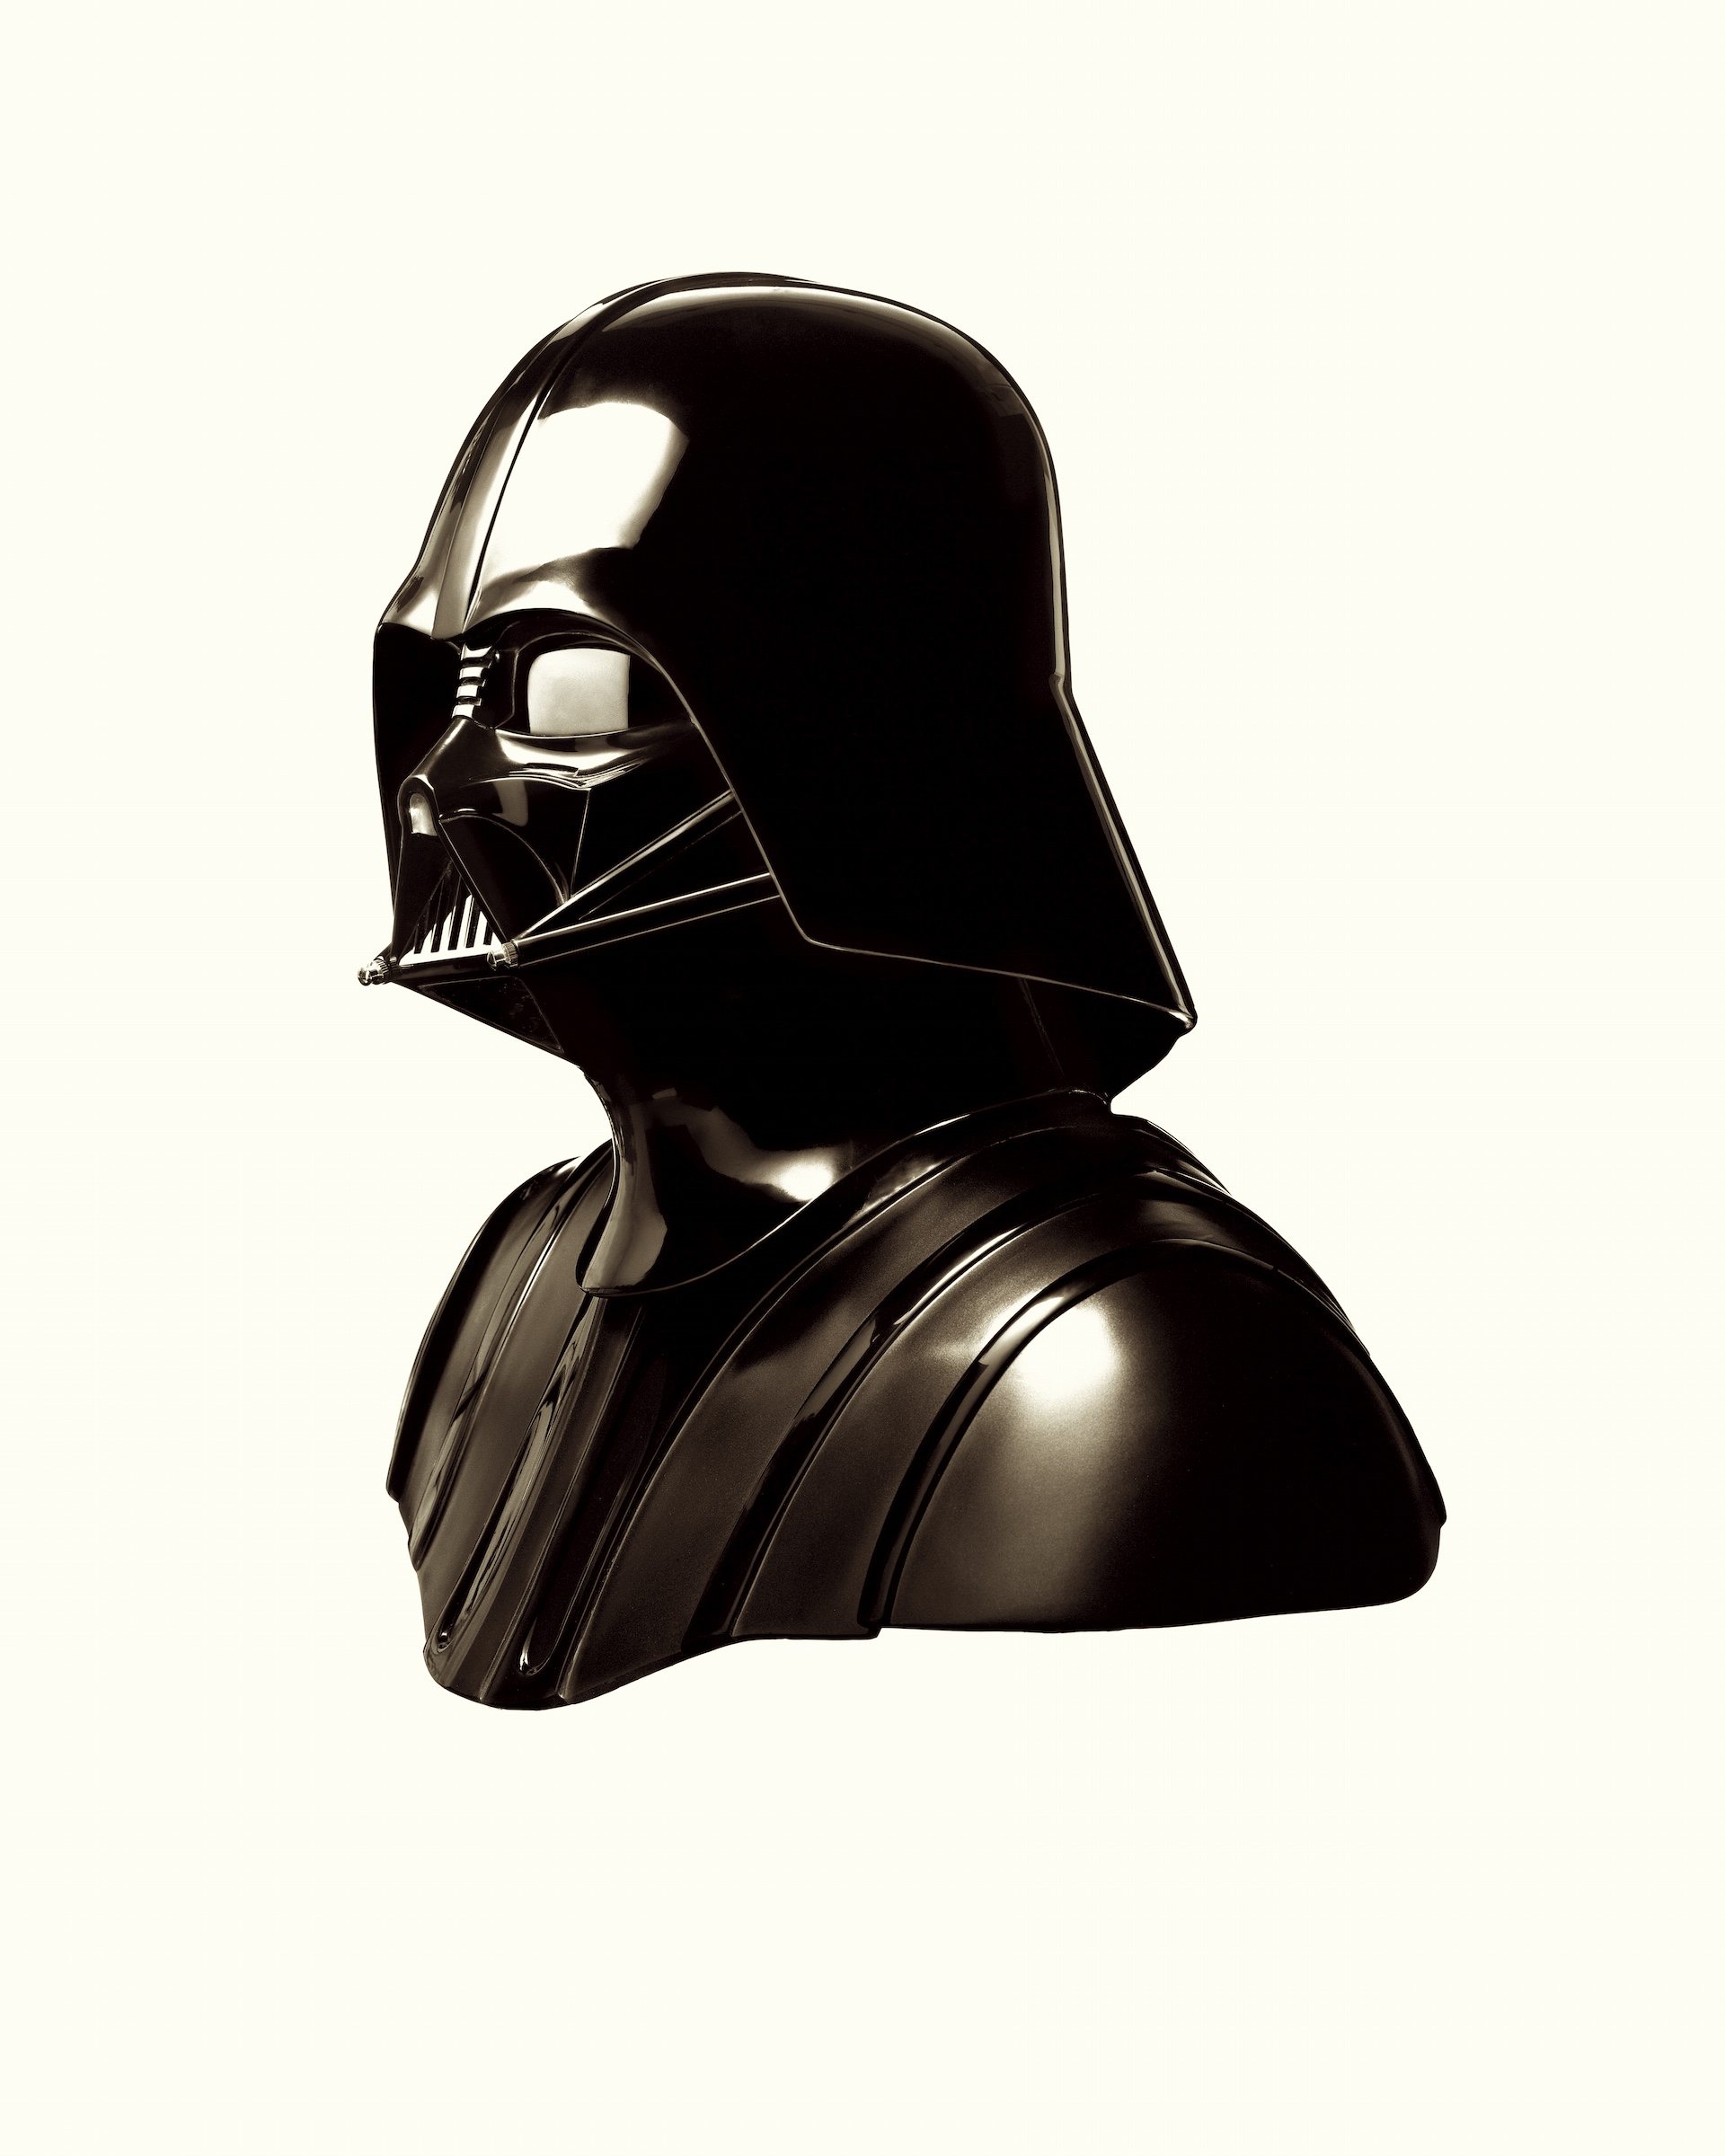 Darth Vader by Albert Watson  Price on request.